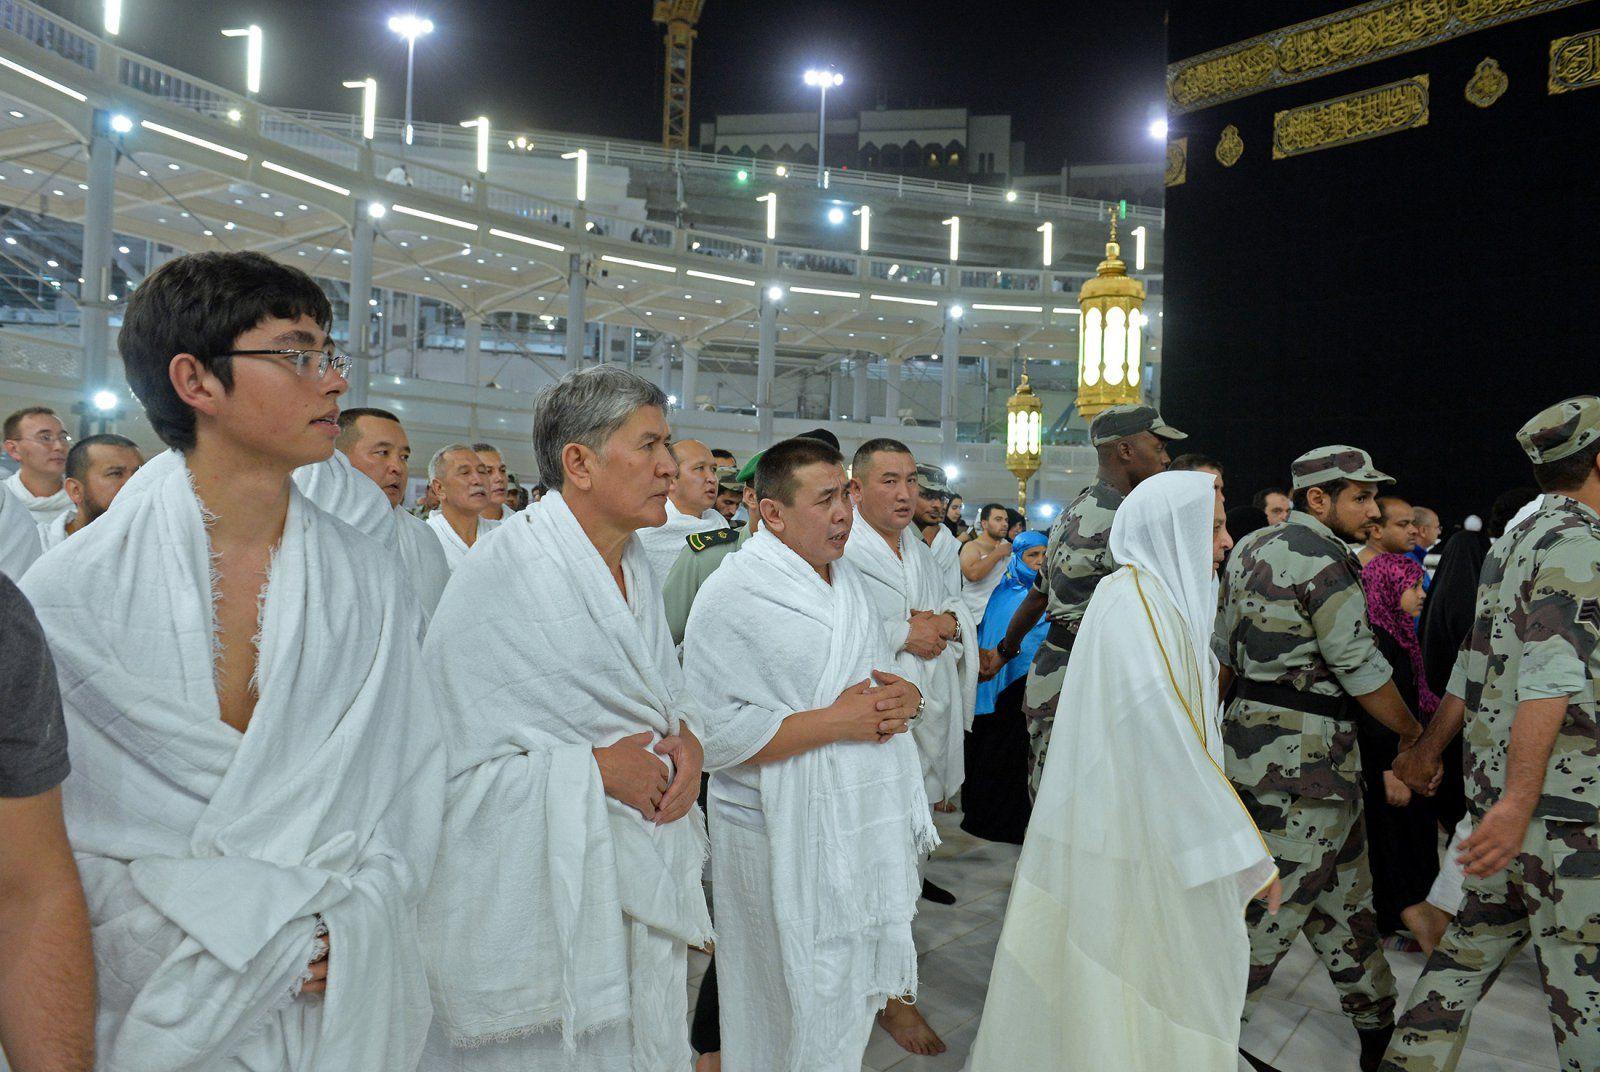 Atambajew auf Pilgerfahrt in Mekka Saudi Arabien